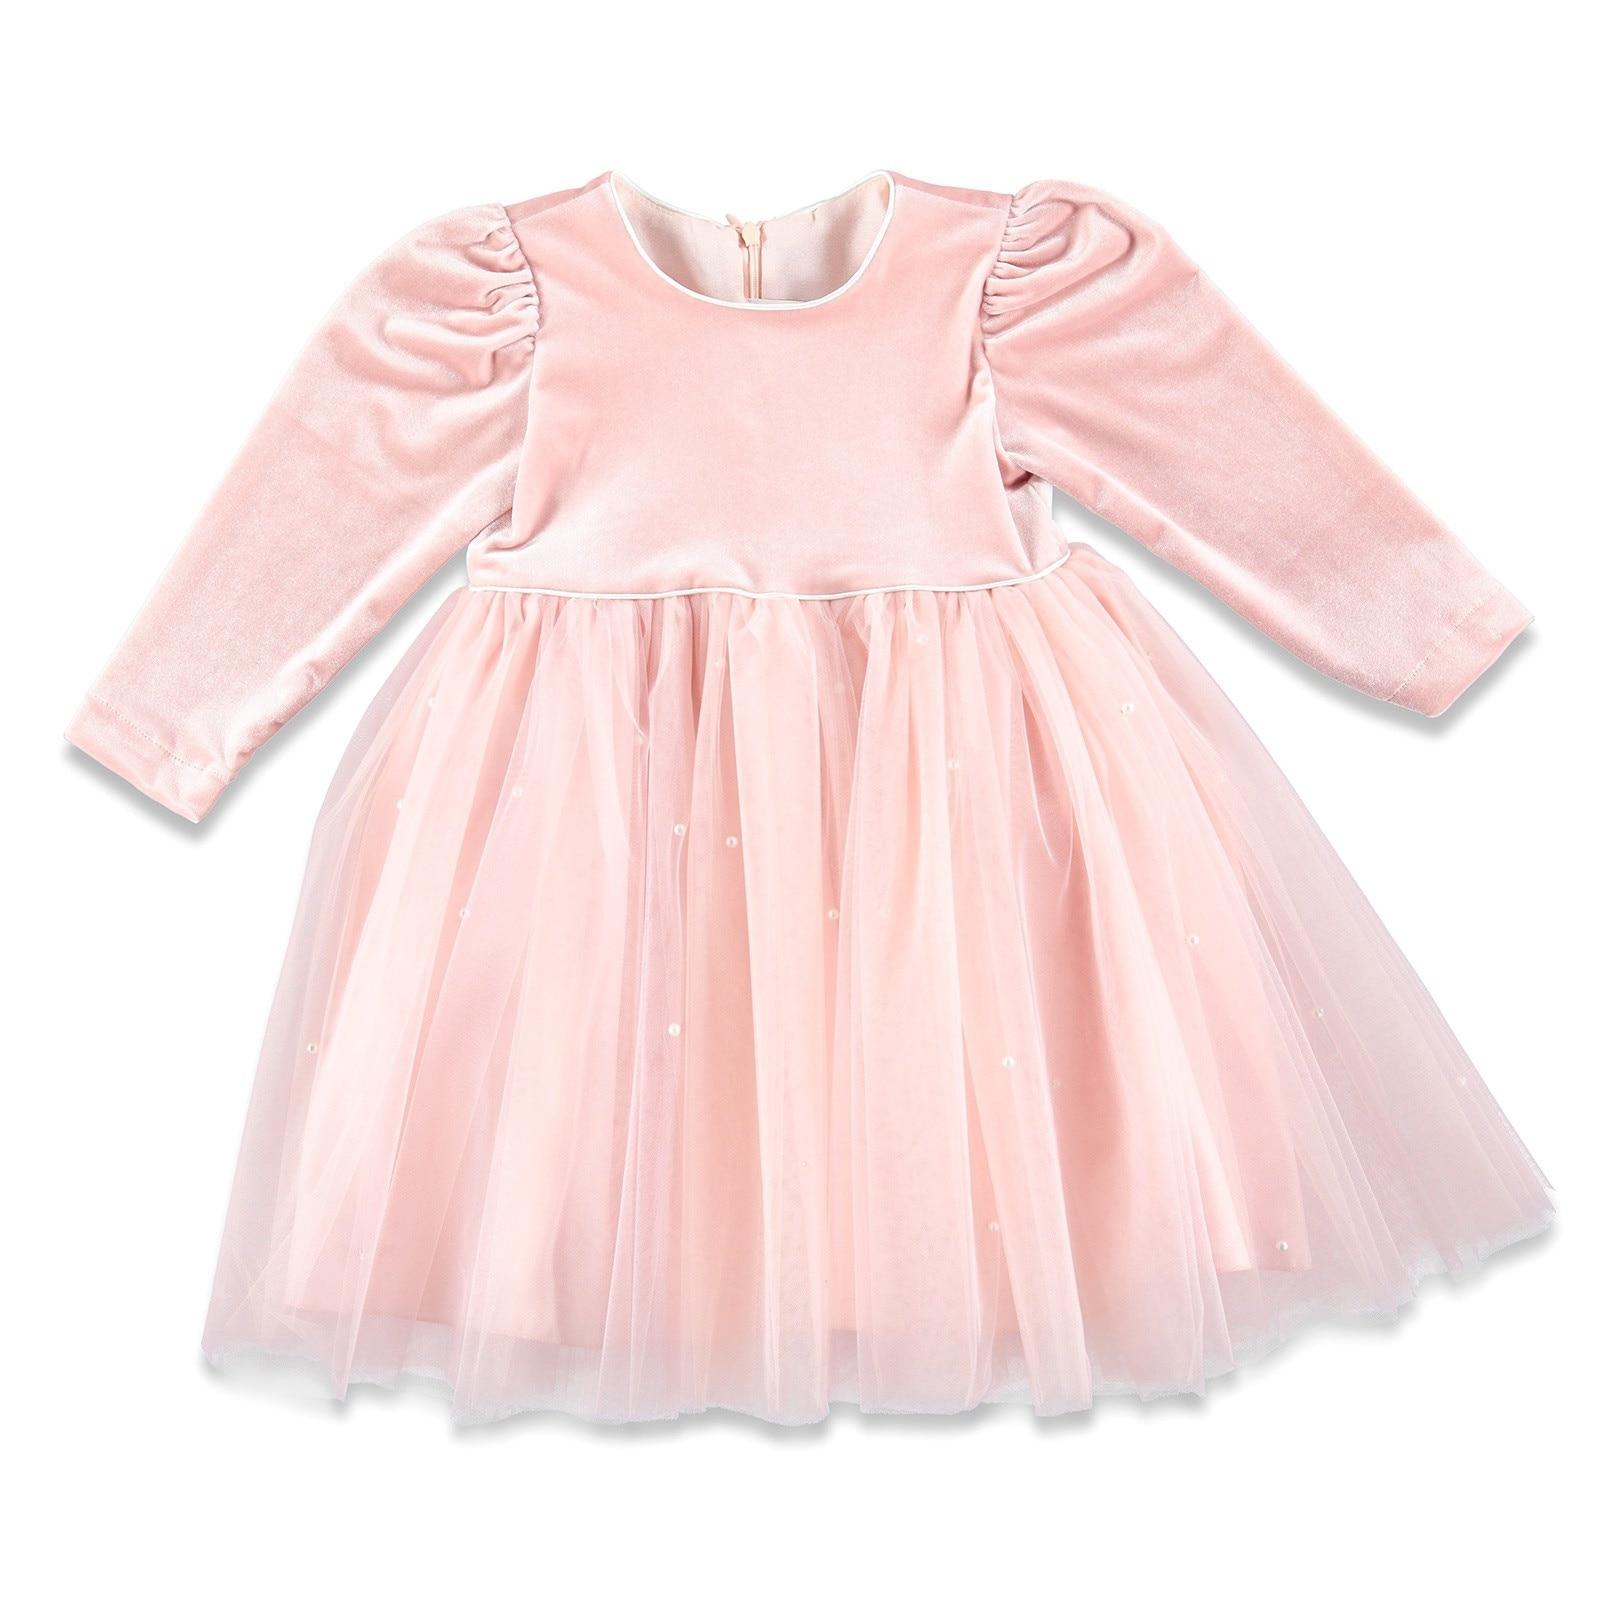 Ebebek ChatonDor Pearl Detail Baby Girl Dress